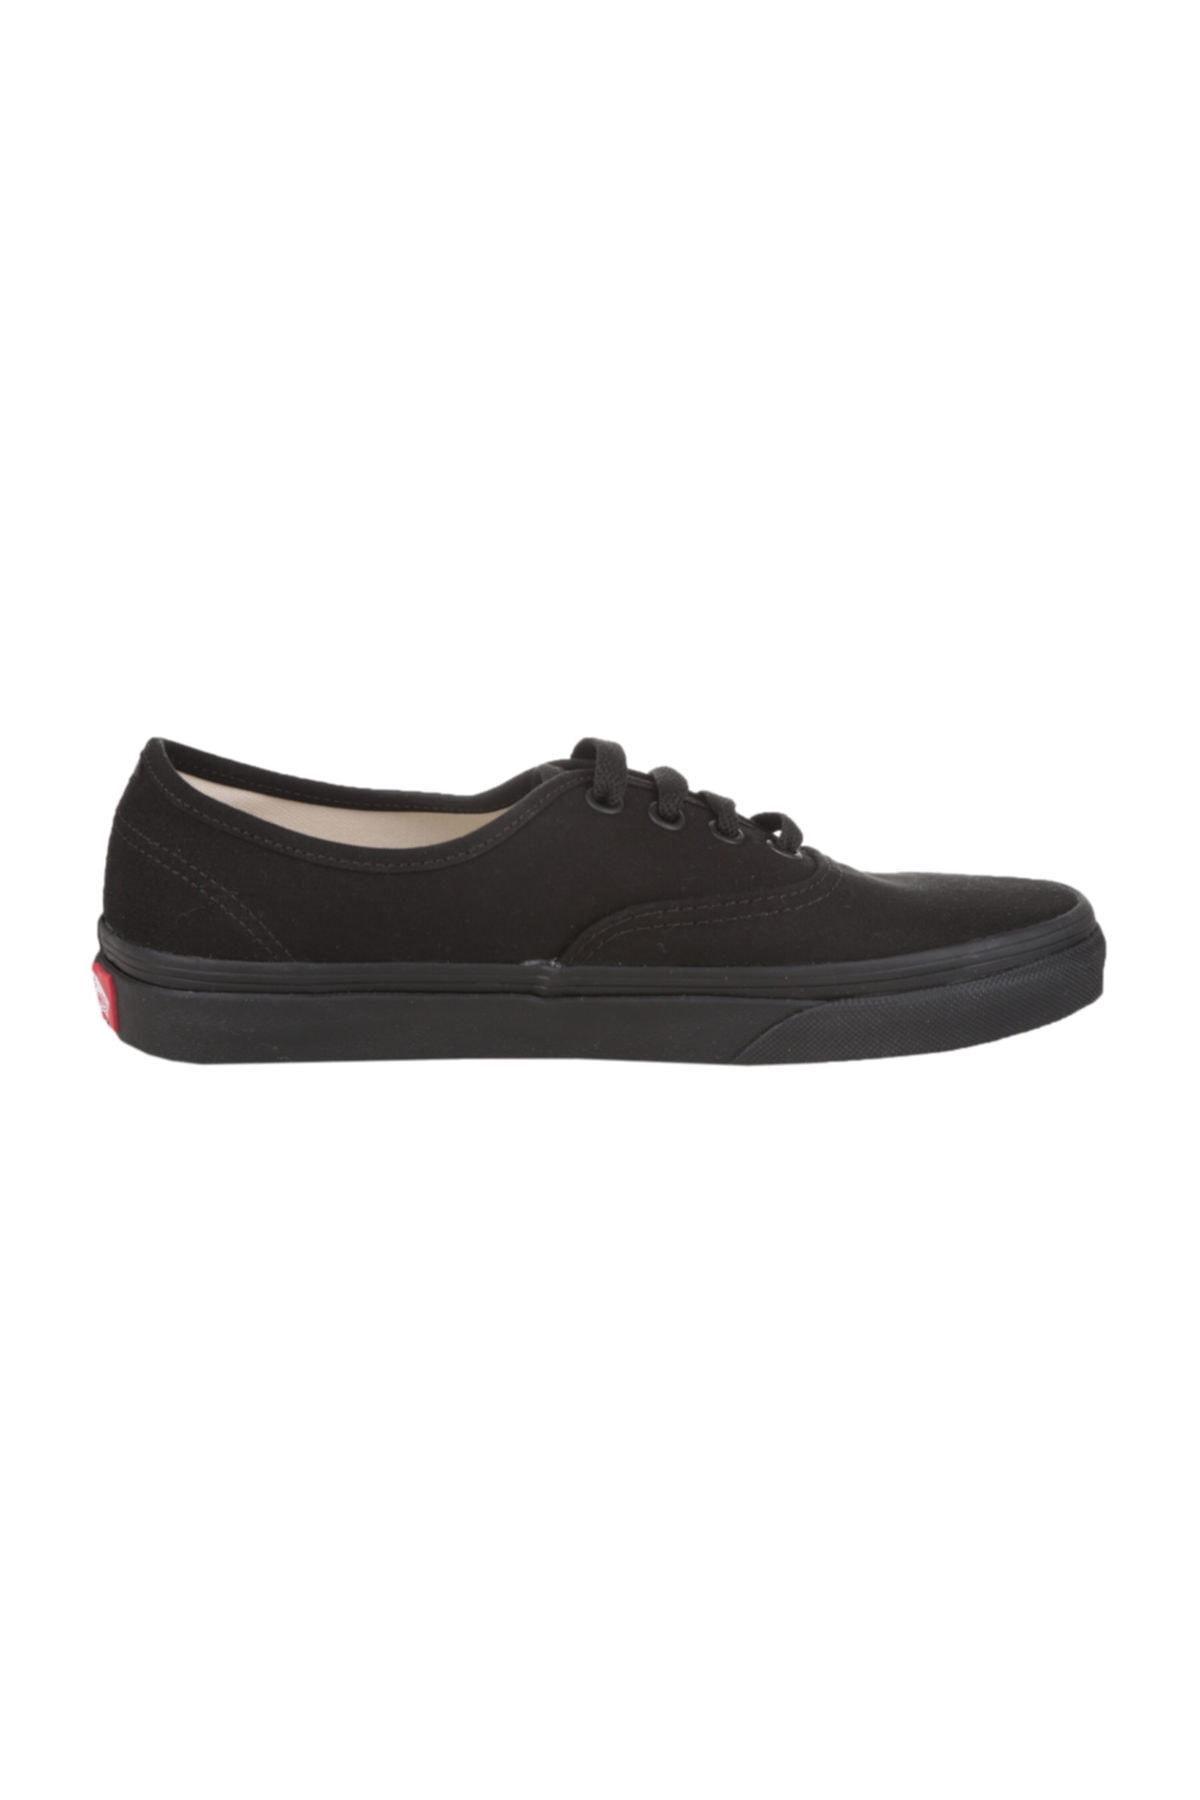 Vans Unisex Spor Ayakkabı Siyah - Authentic  - 000EE3BKA1 1